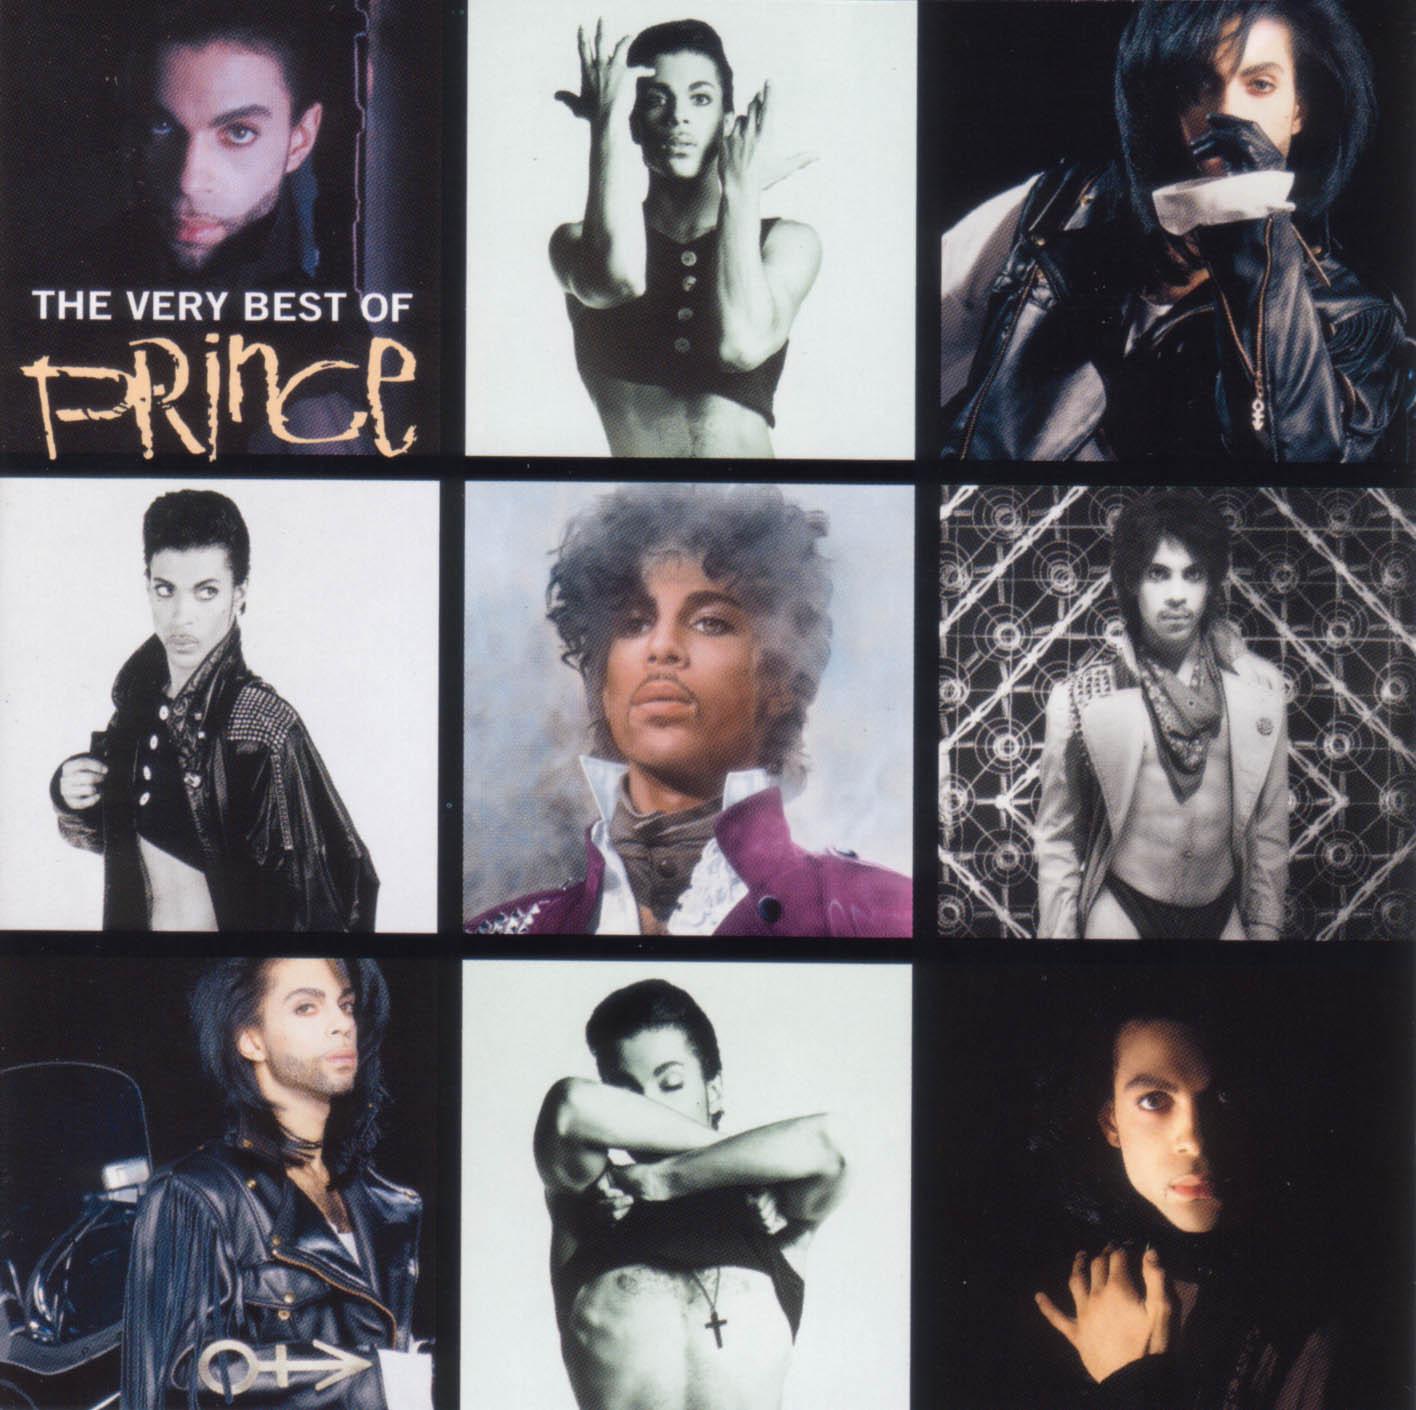 2009-08-11-Princescompilationalbumcoveralsoservesasshowcaseforhisstyle.jpg